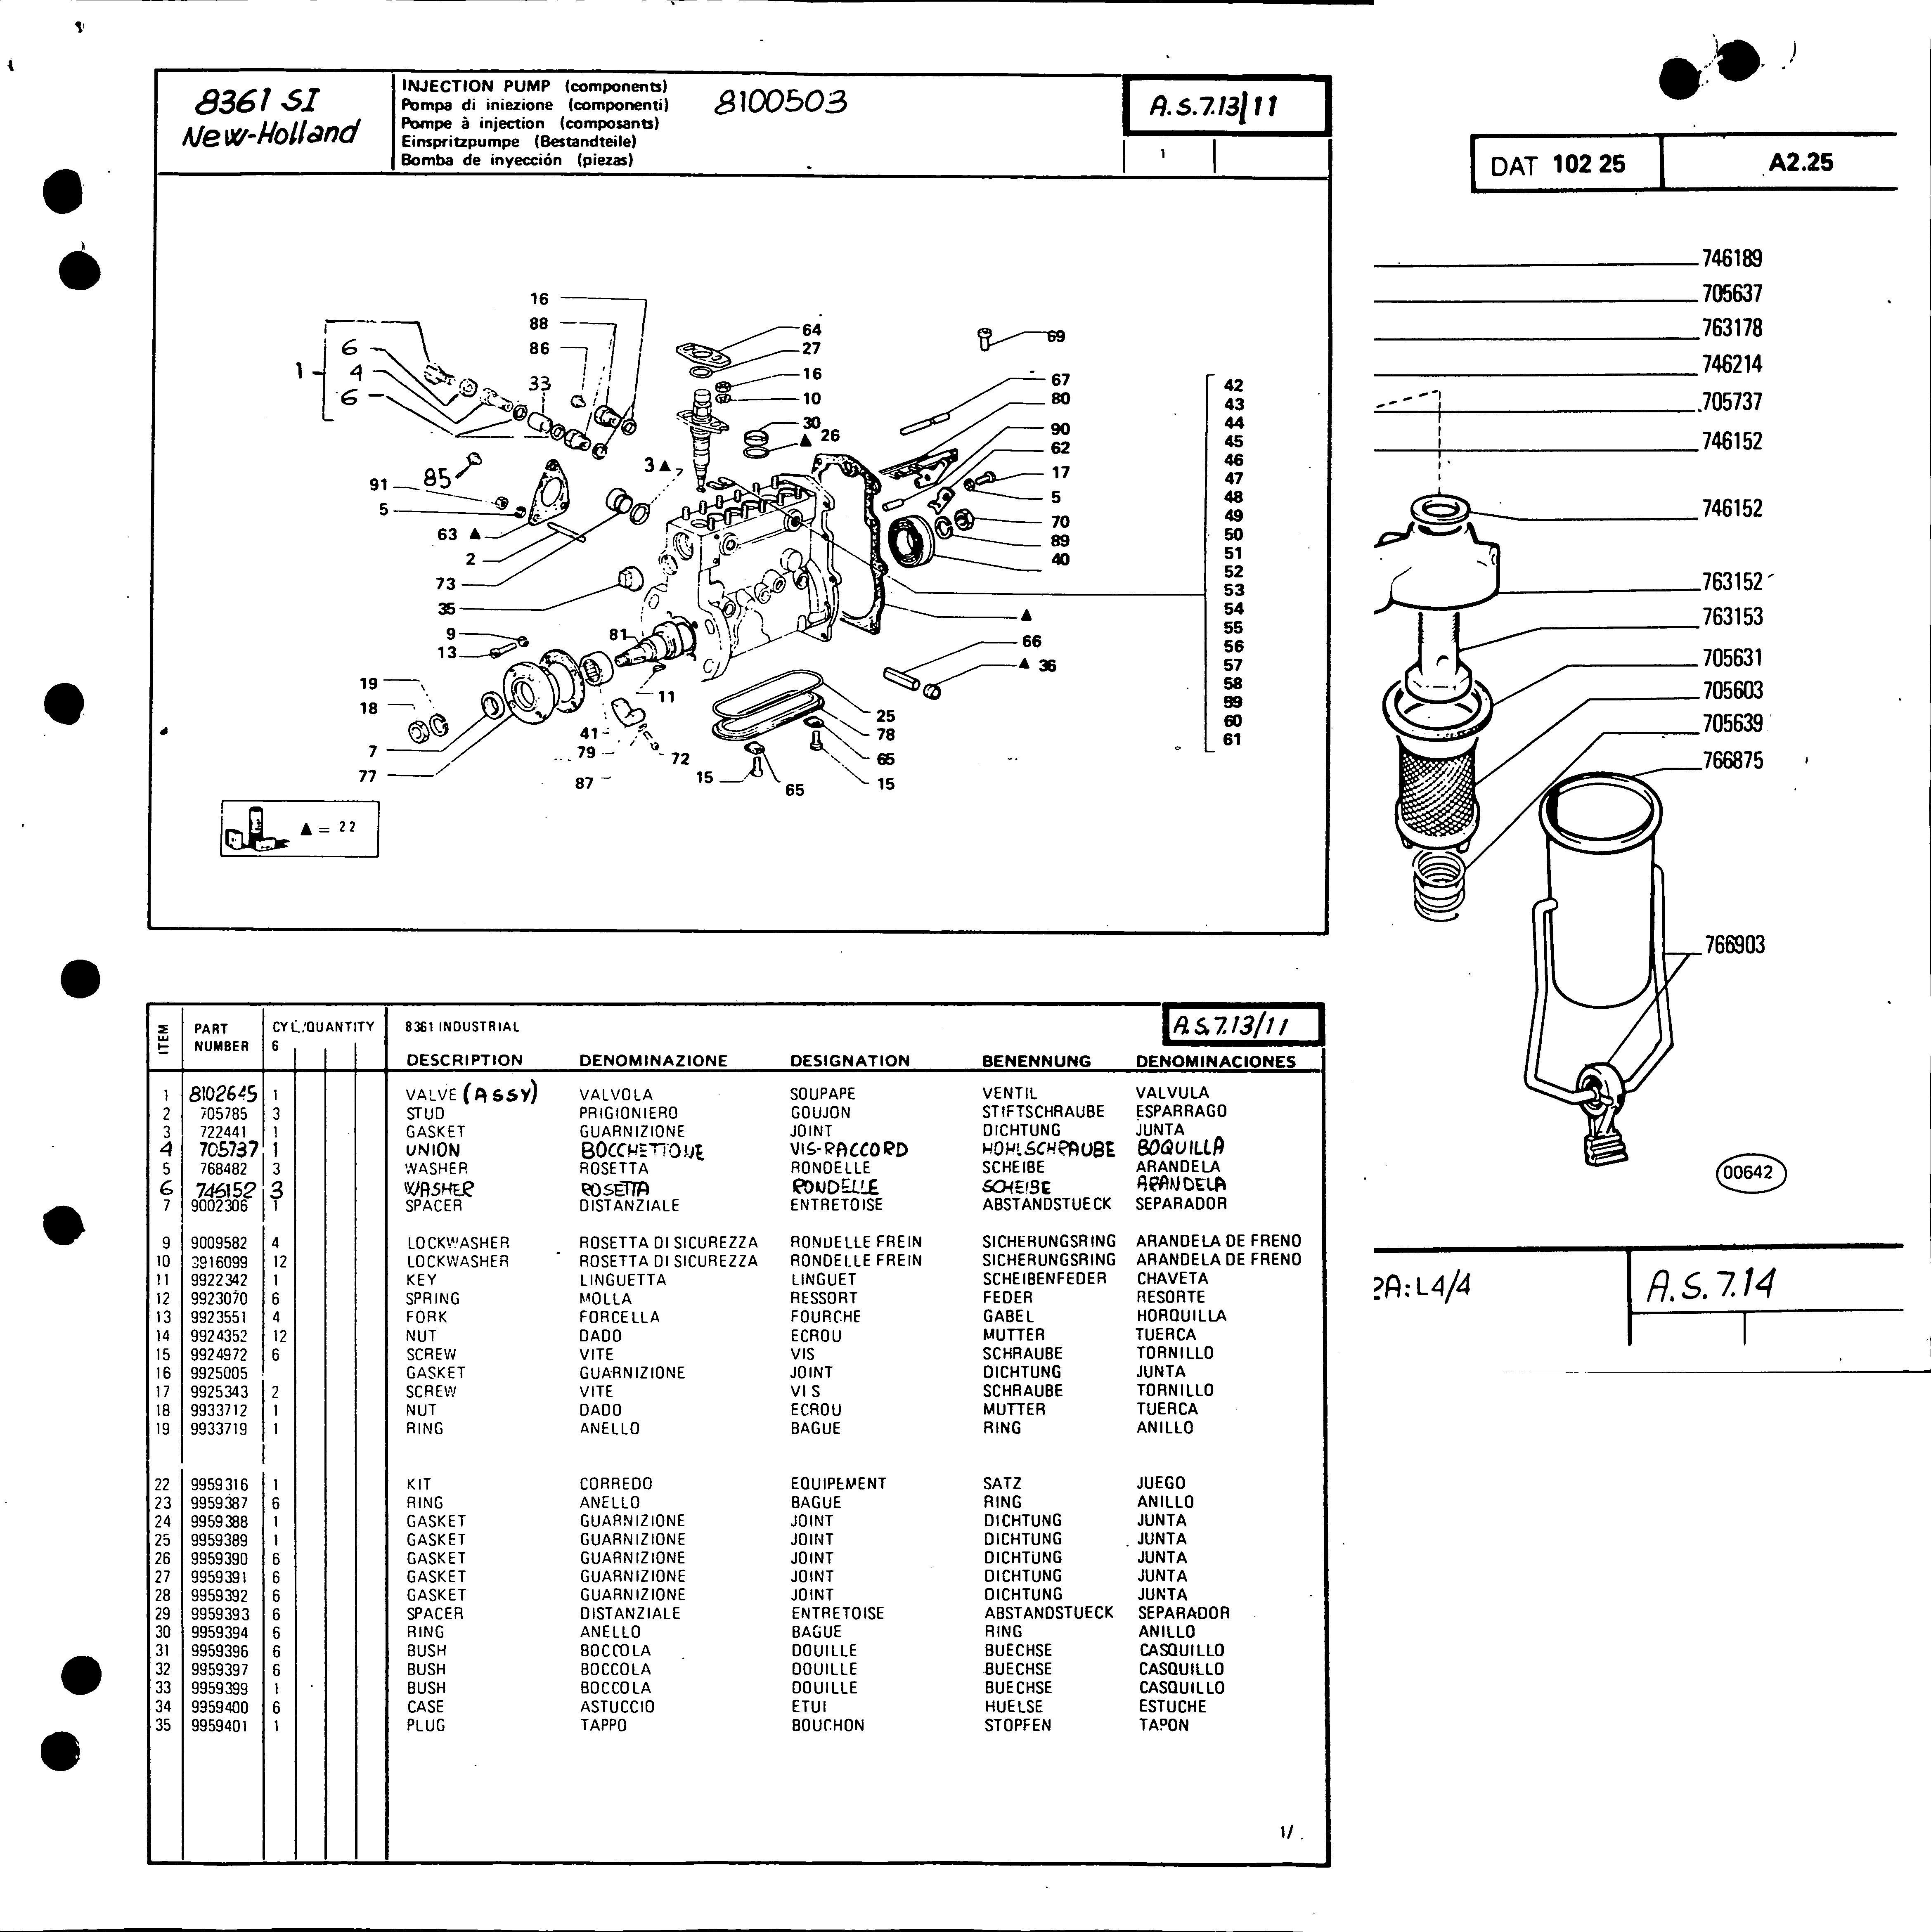 New Holland 8080 8361sl Parts Manual Download New Holland Repair And Maintenance Tractors